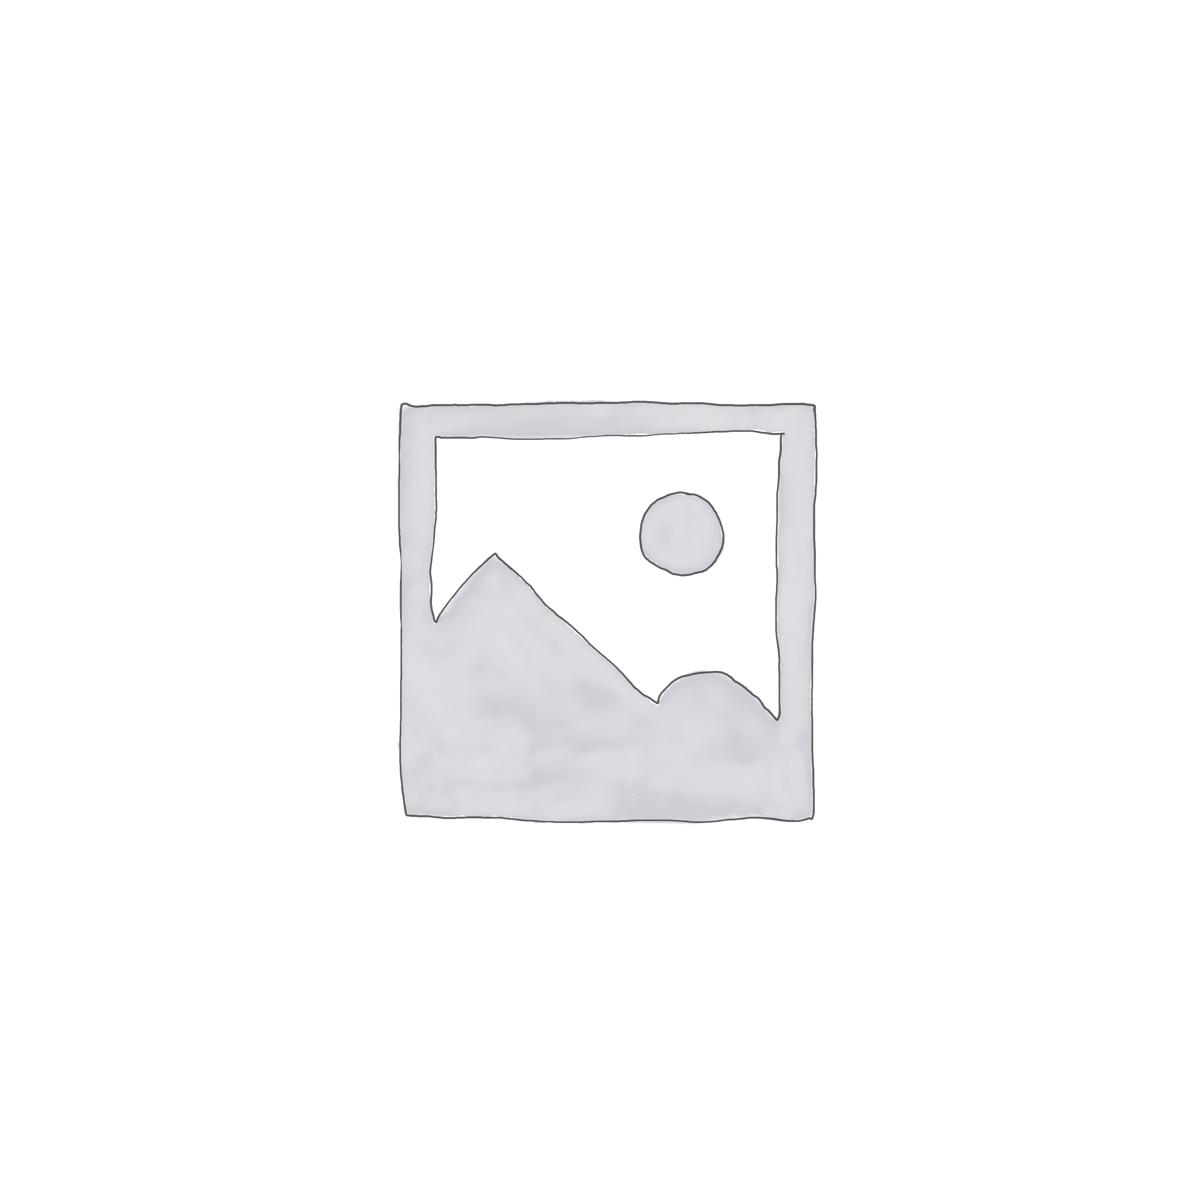 Geometric Gold Line Wall Decal Sticker